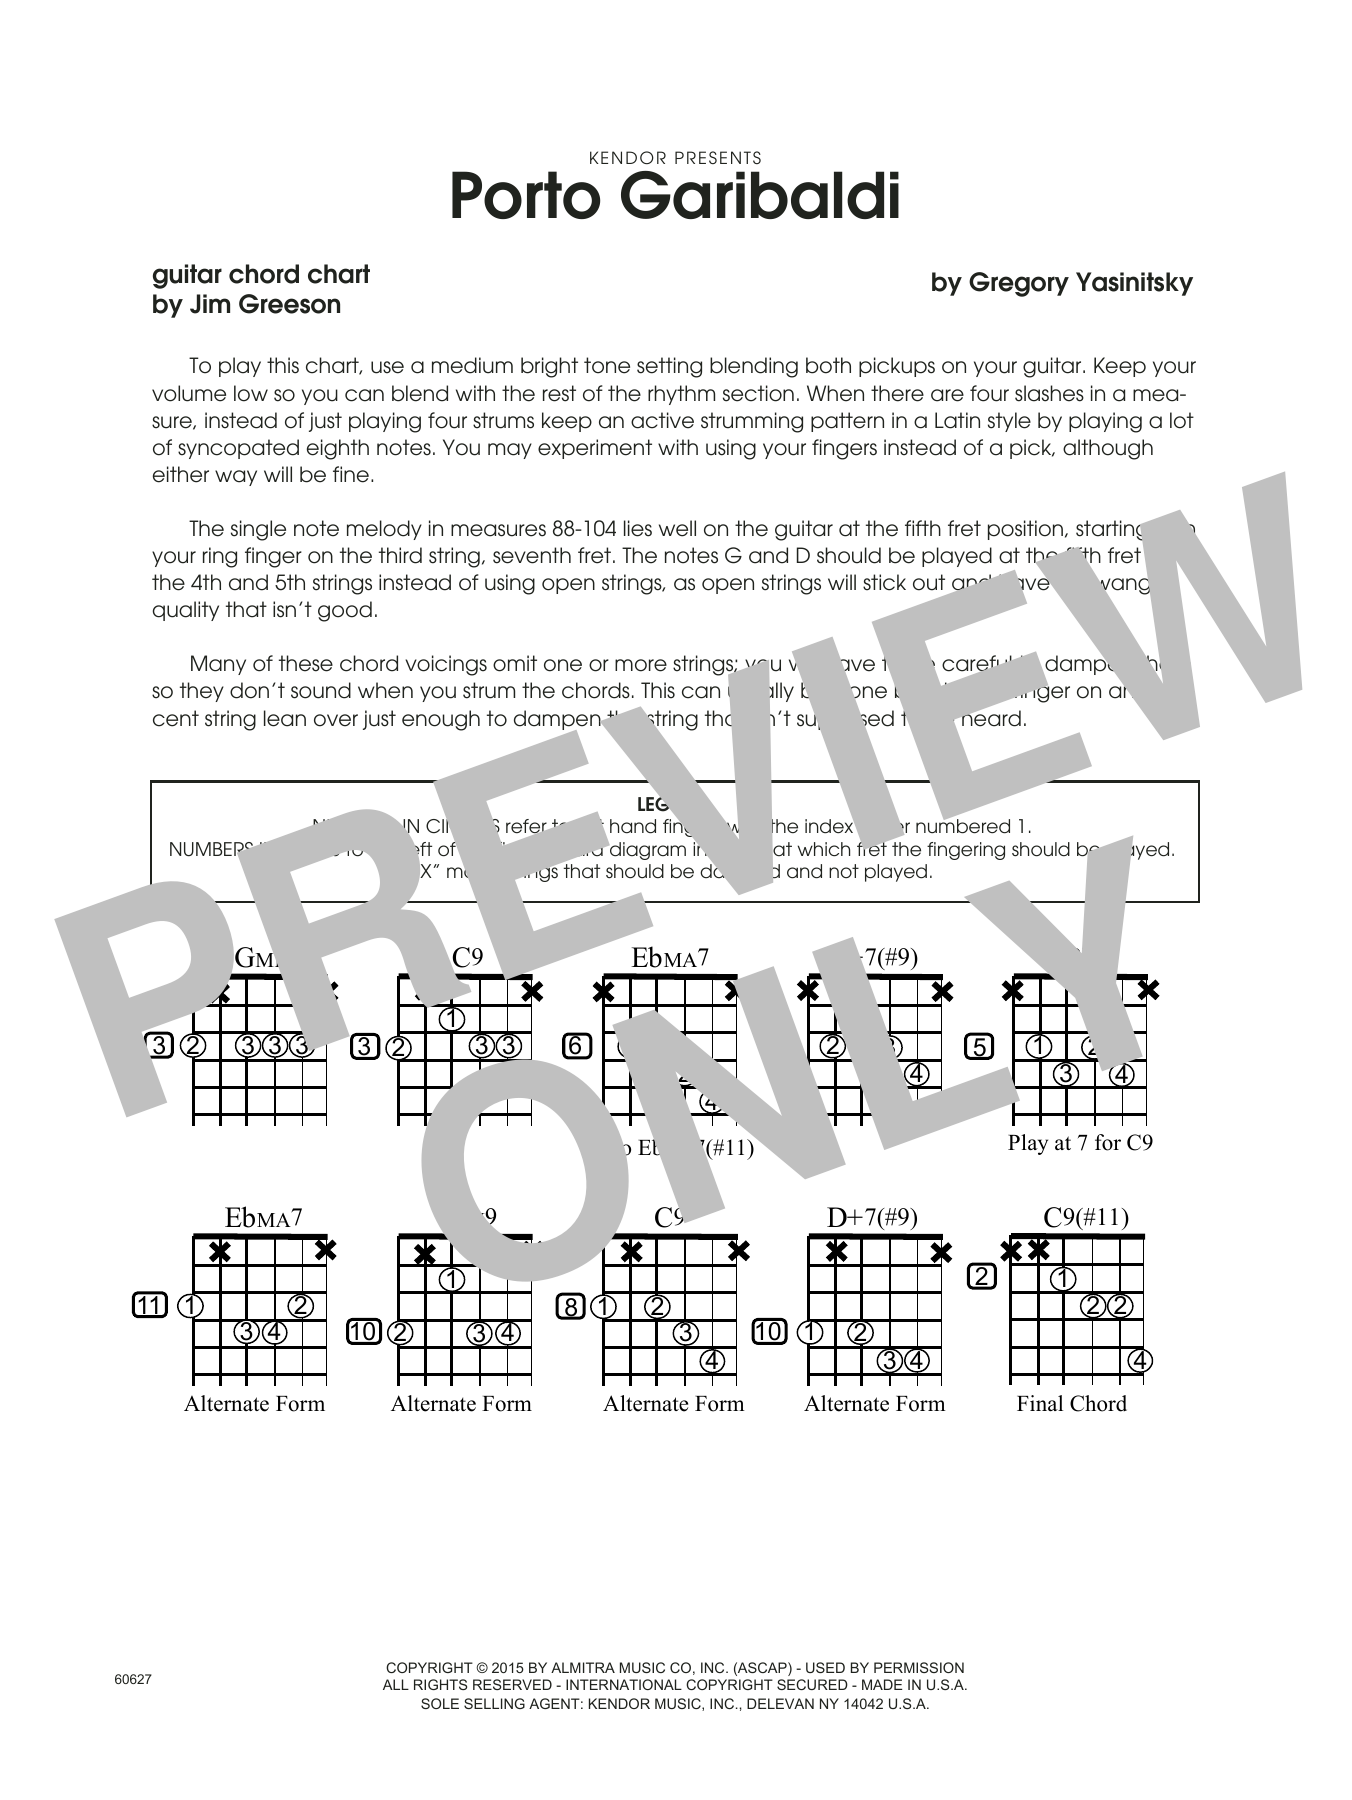 Porto Garibaldi - Guitar Chord Chart Sheet Music